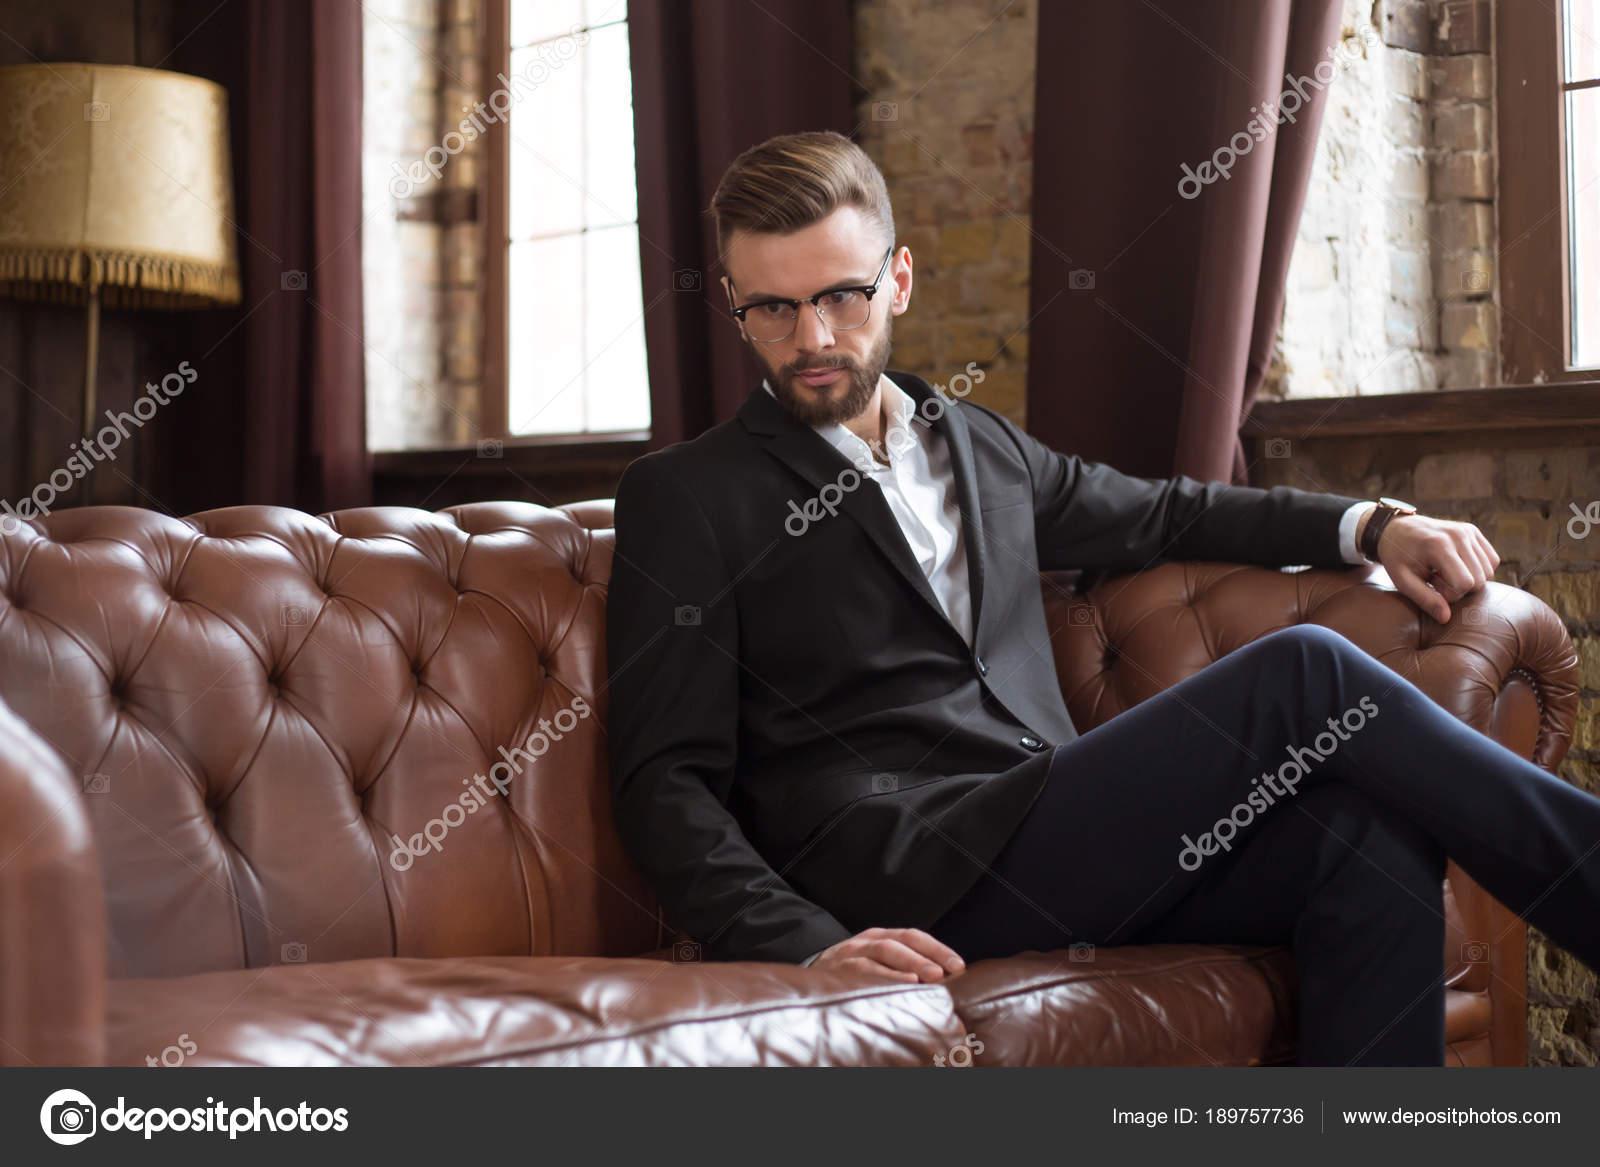 Vestito Elegante Ufficio : Bello eleganti barbuto uomo affari sicuro vestito elegante